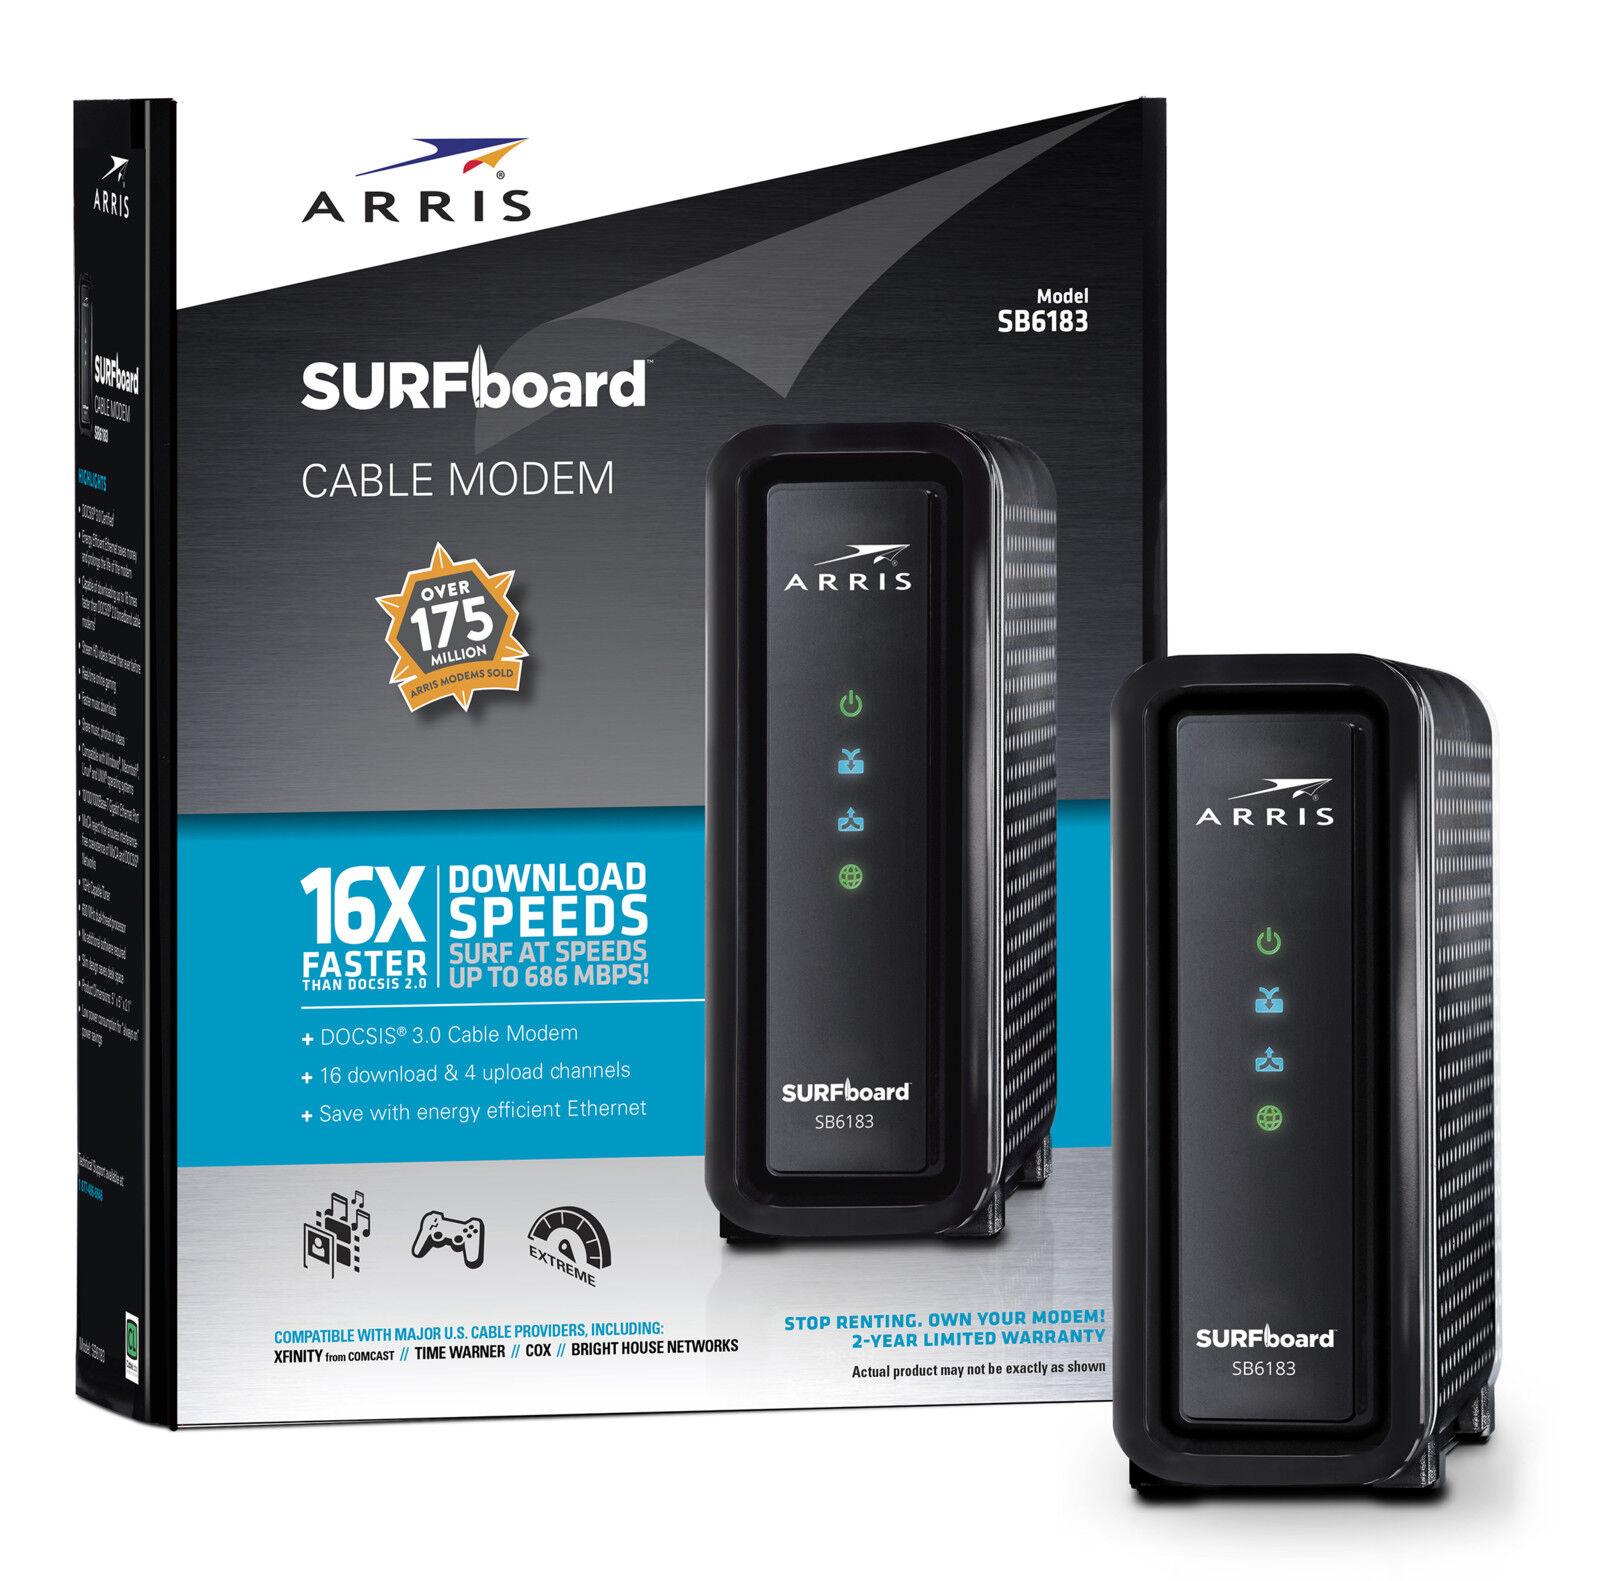 Arris - Surfboard 600 Series Docsis 3.0 Cable Modem - White